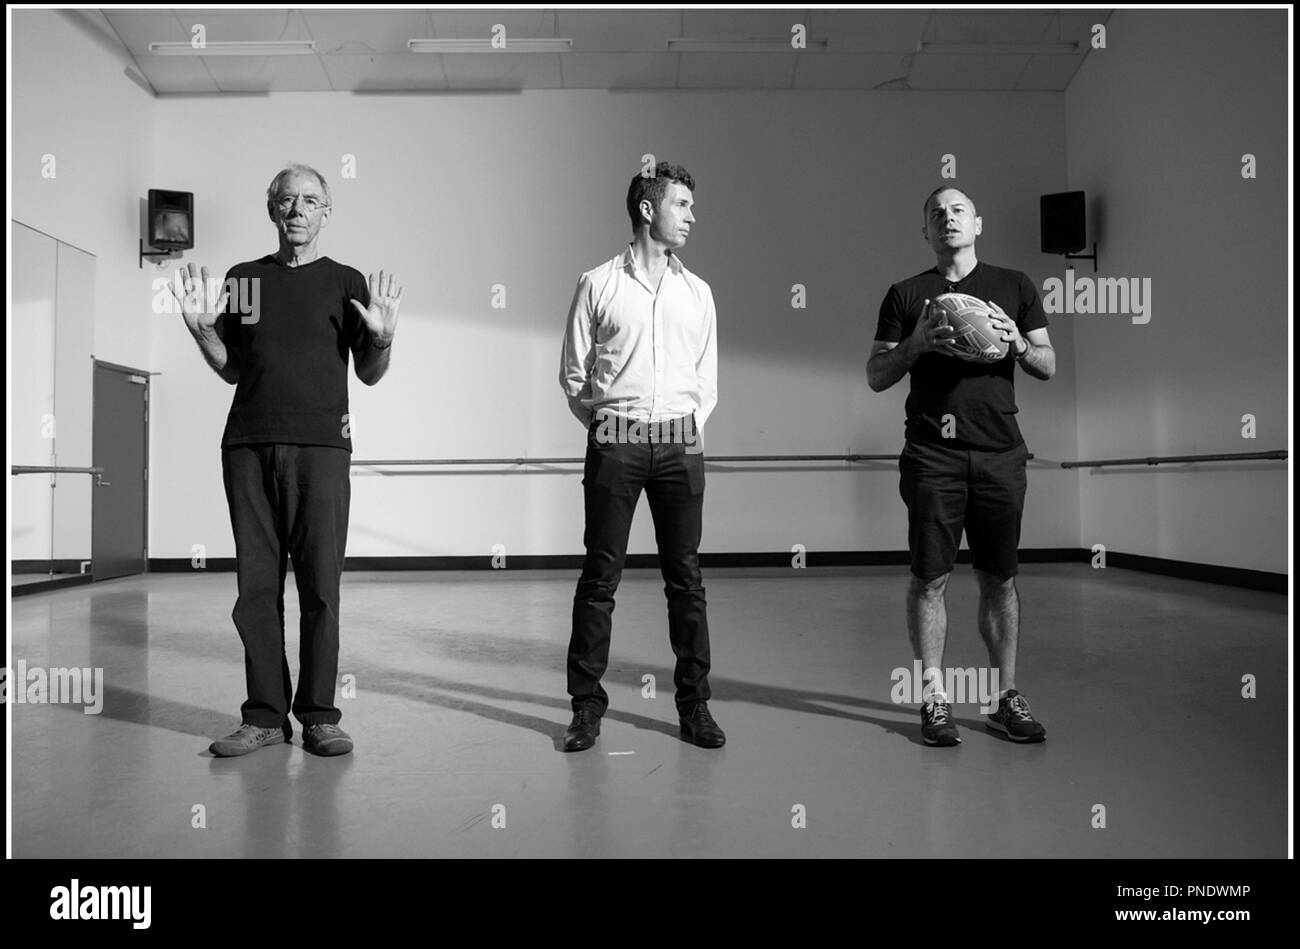 Prod DB © M. Klitscher - General Film Corporation / DR GISELLE de Toa Fraser 2014 NZ avec Leon Narbey (directeur photo), Matthew Metcalfe (producteur) et Toa Fraser sur le tournage - Stock Image